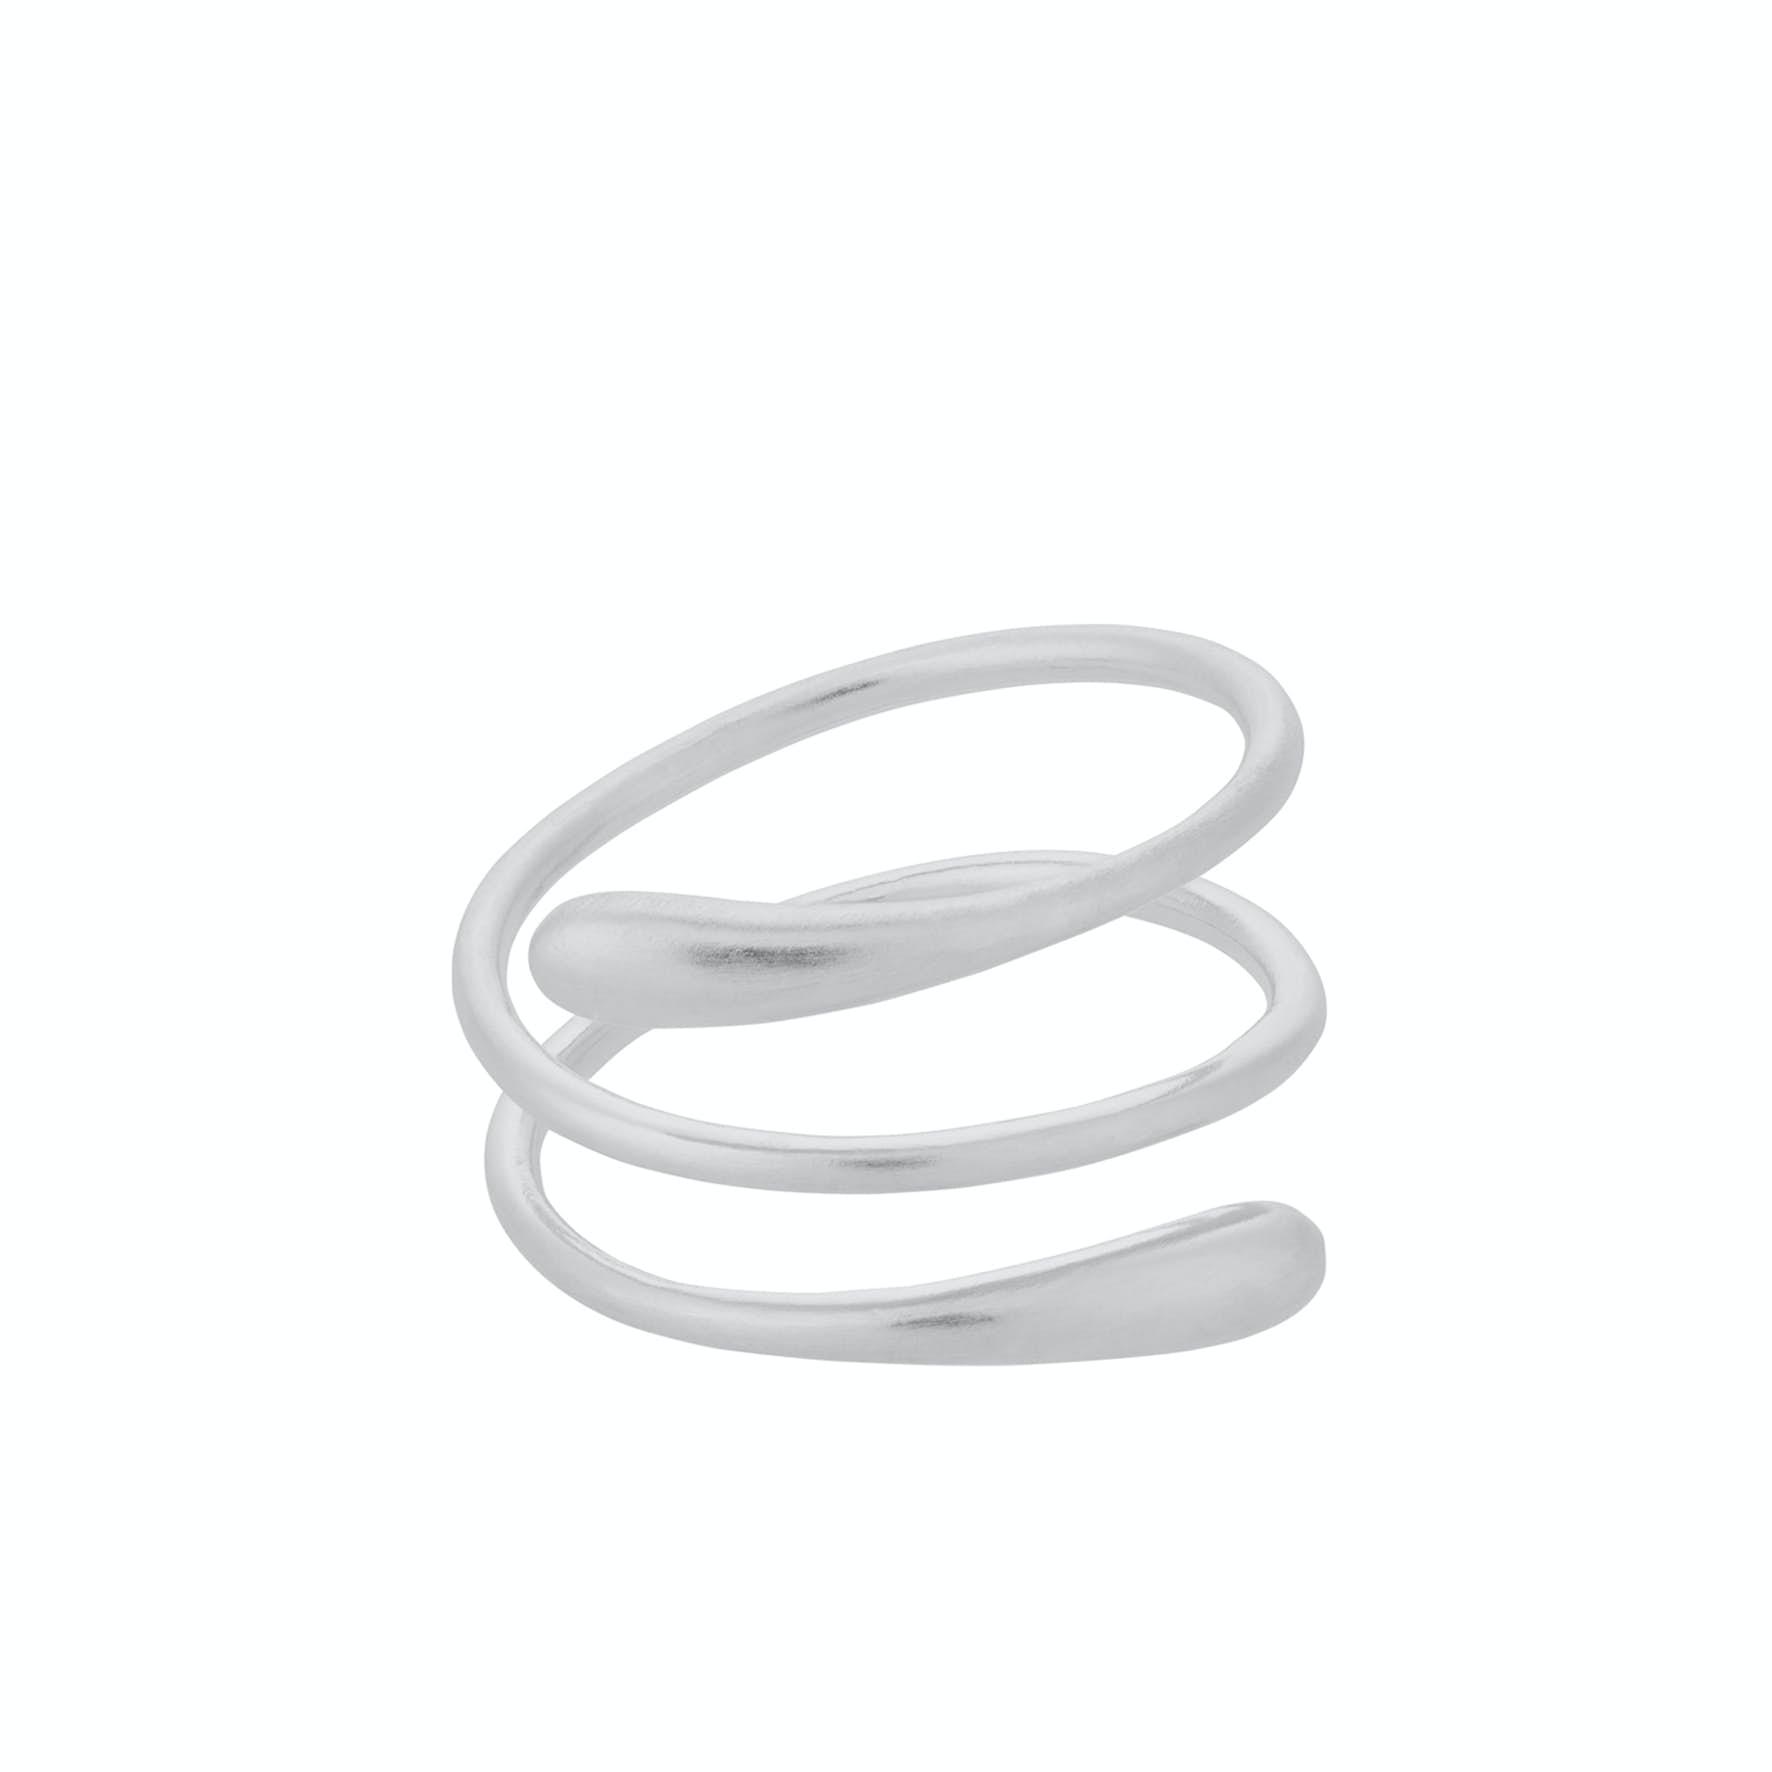 Waterdrop Ring von Pernille Corydon in Silber Sterling 925